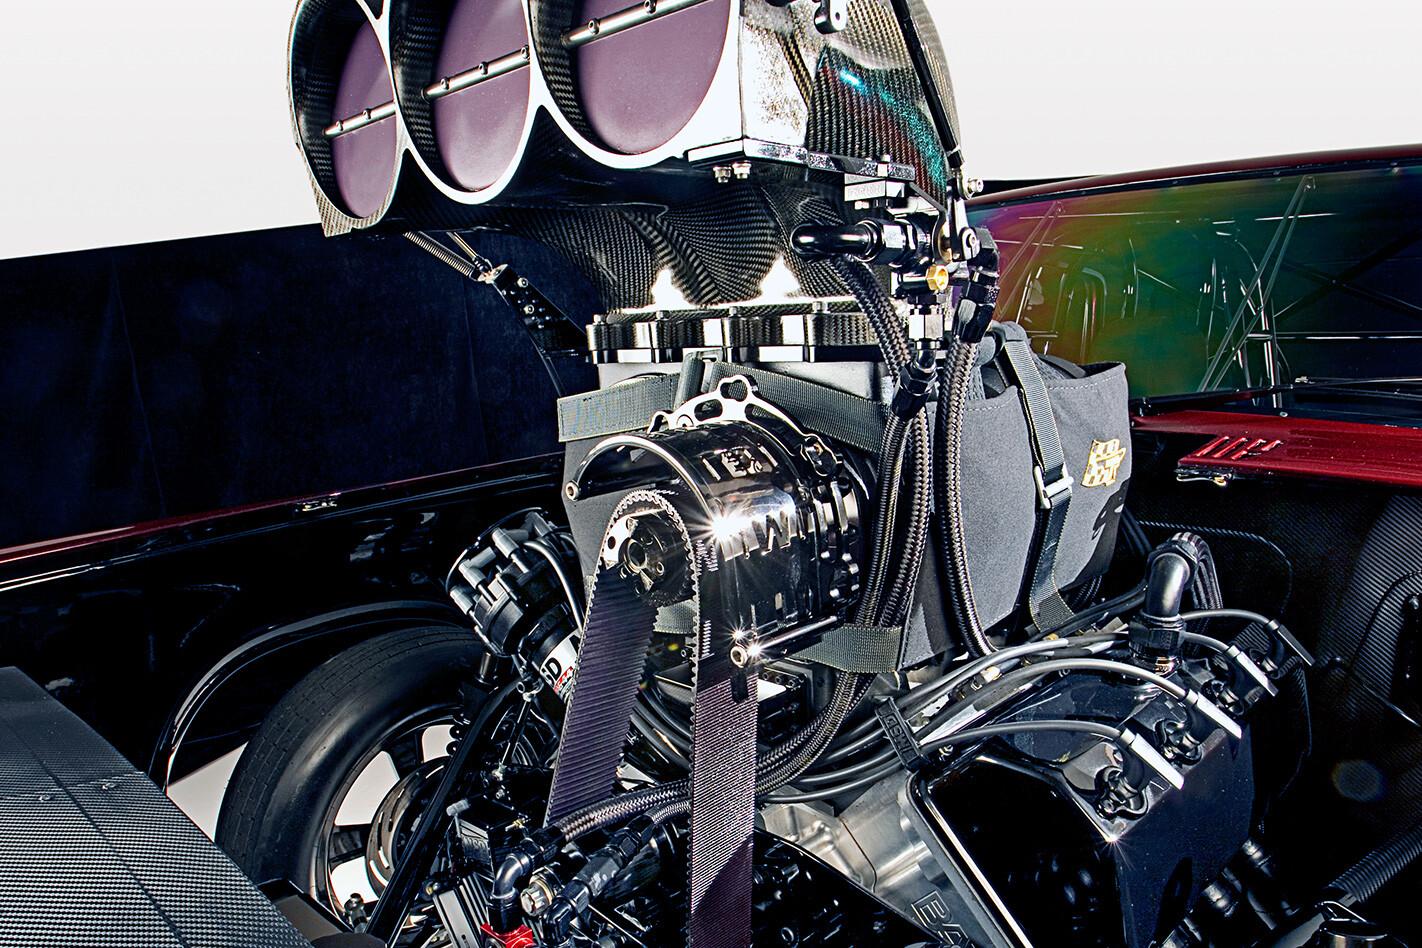 VC Valiant engine